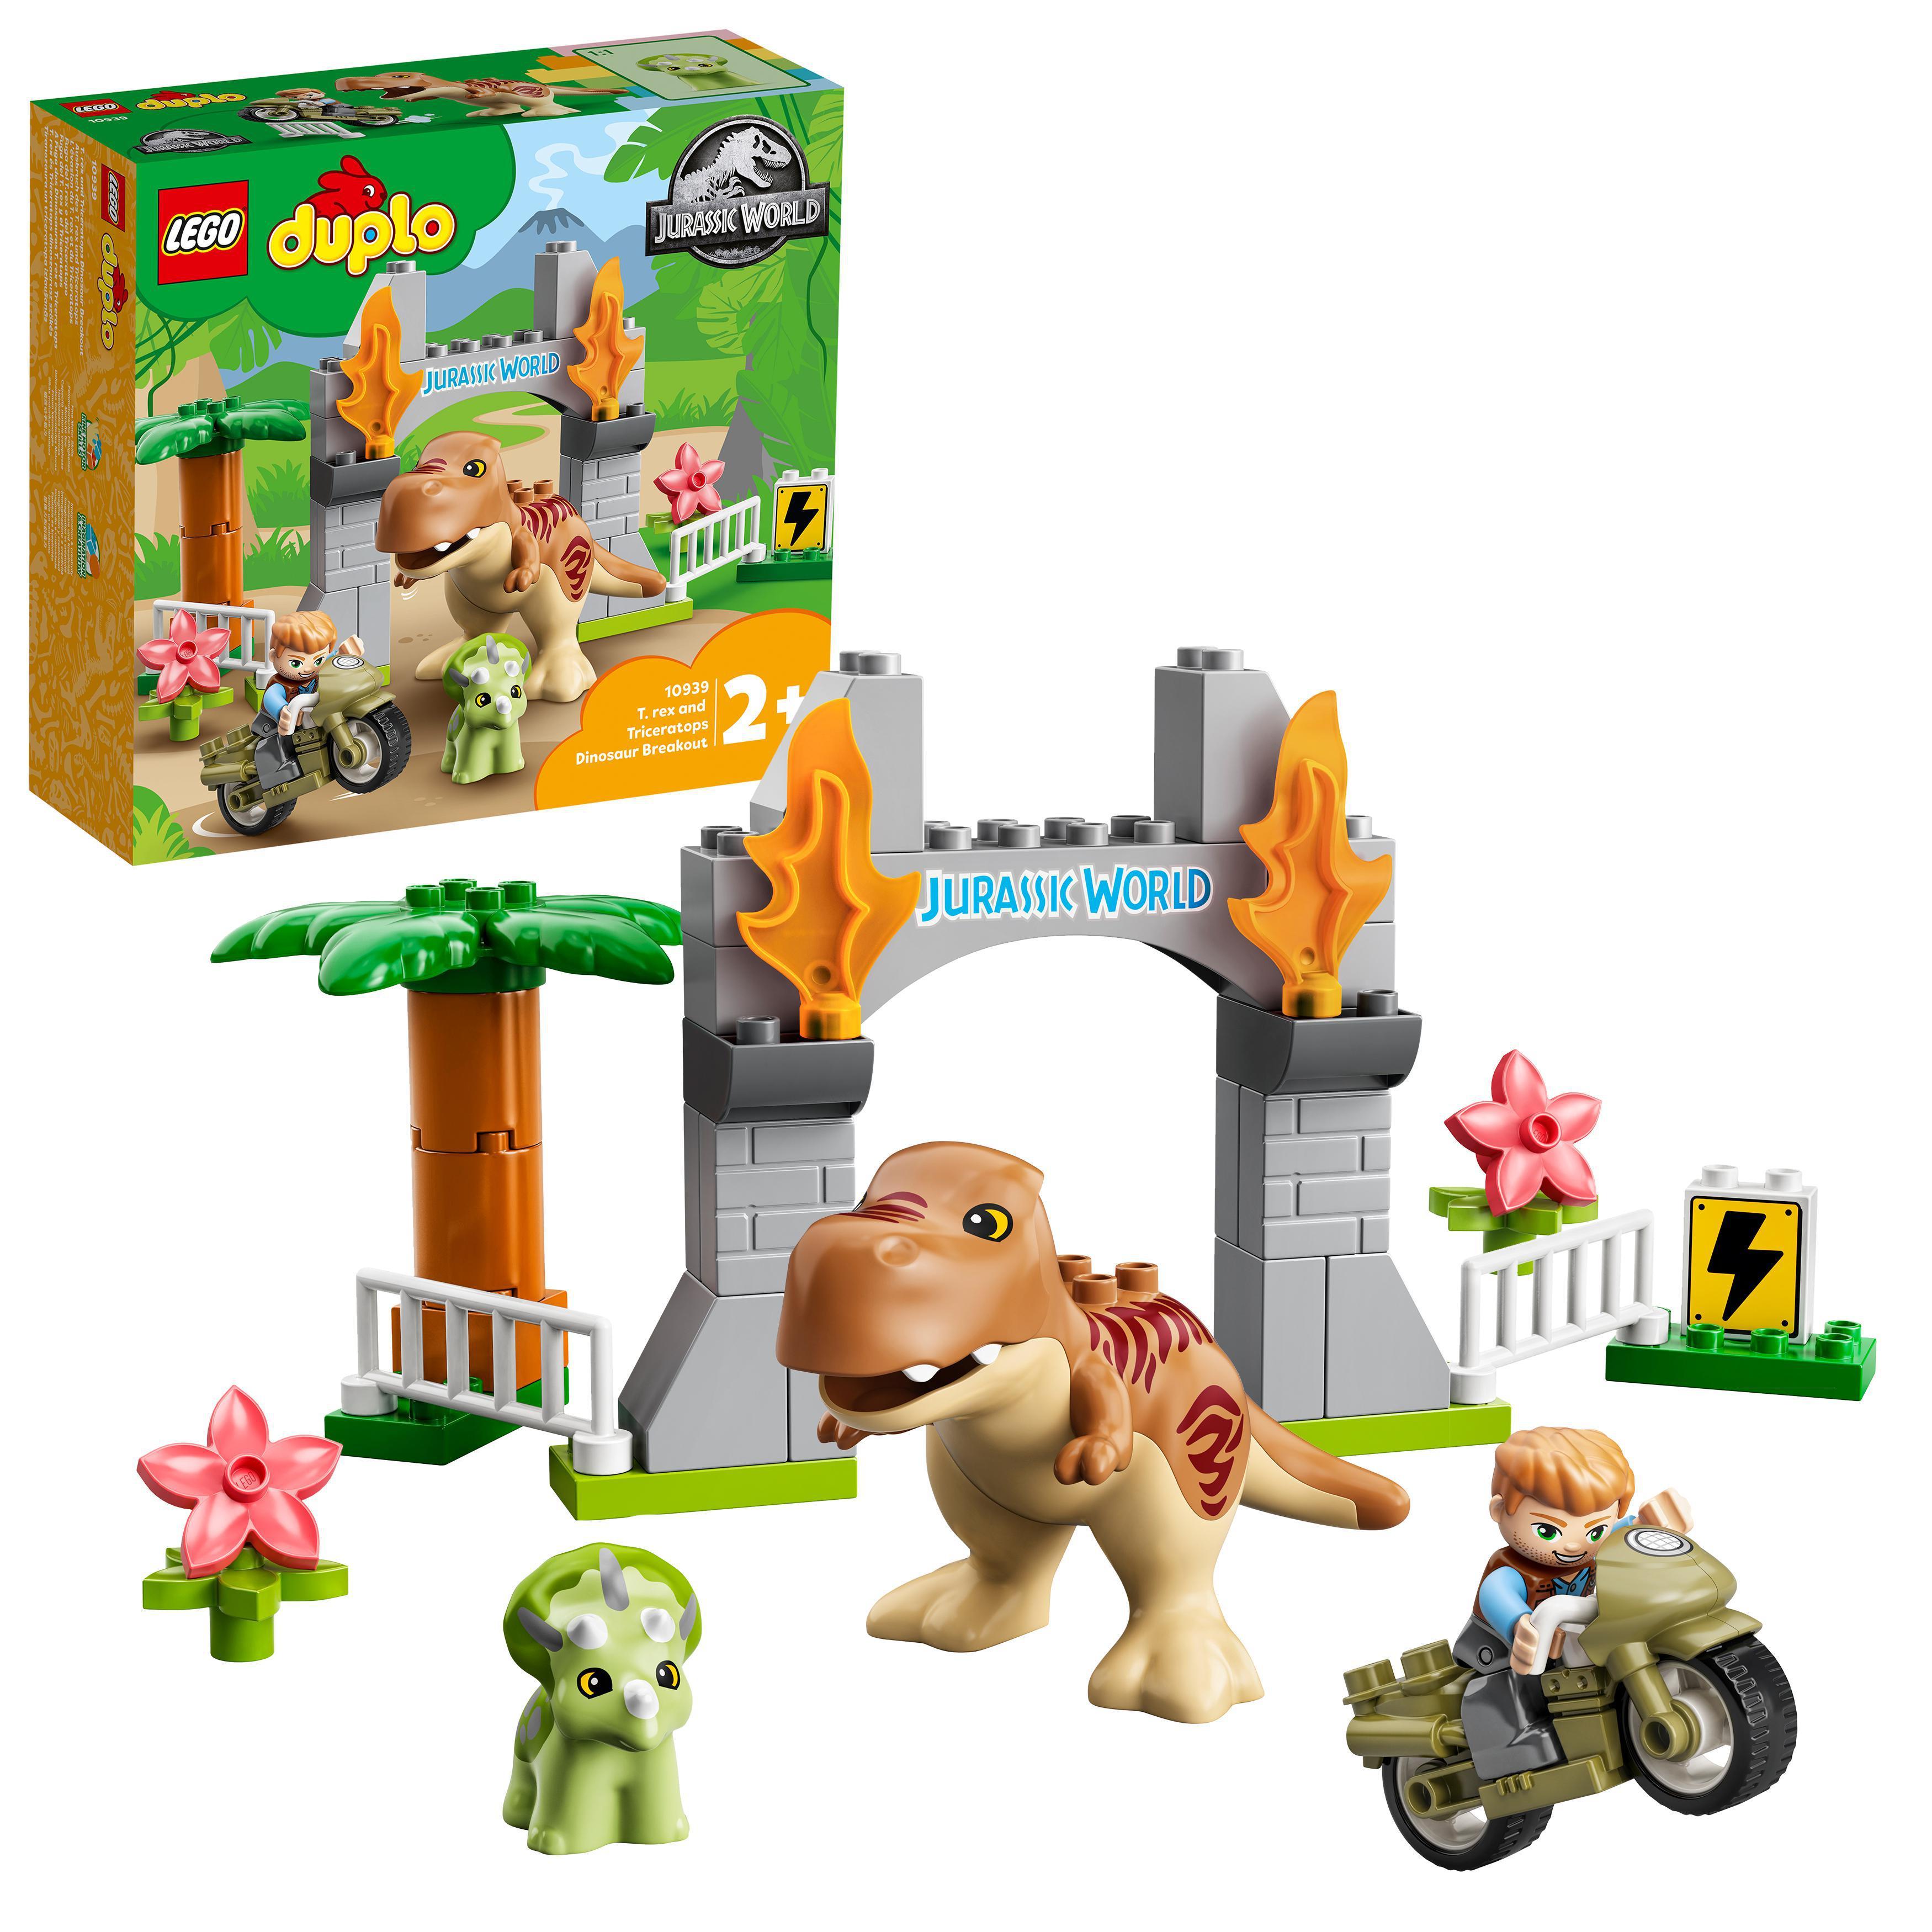 LEGO Jurassic World - T. rex and Triceratops Dinosaur Breakout (10939)